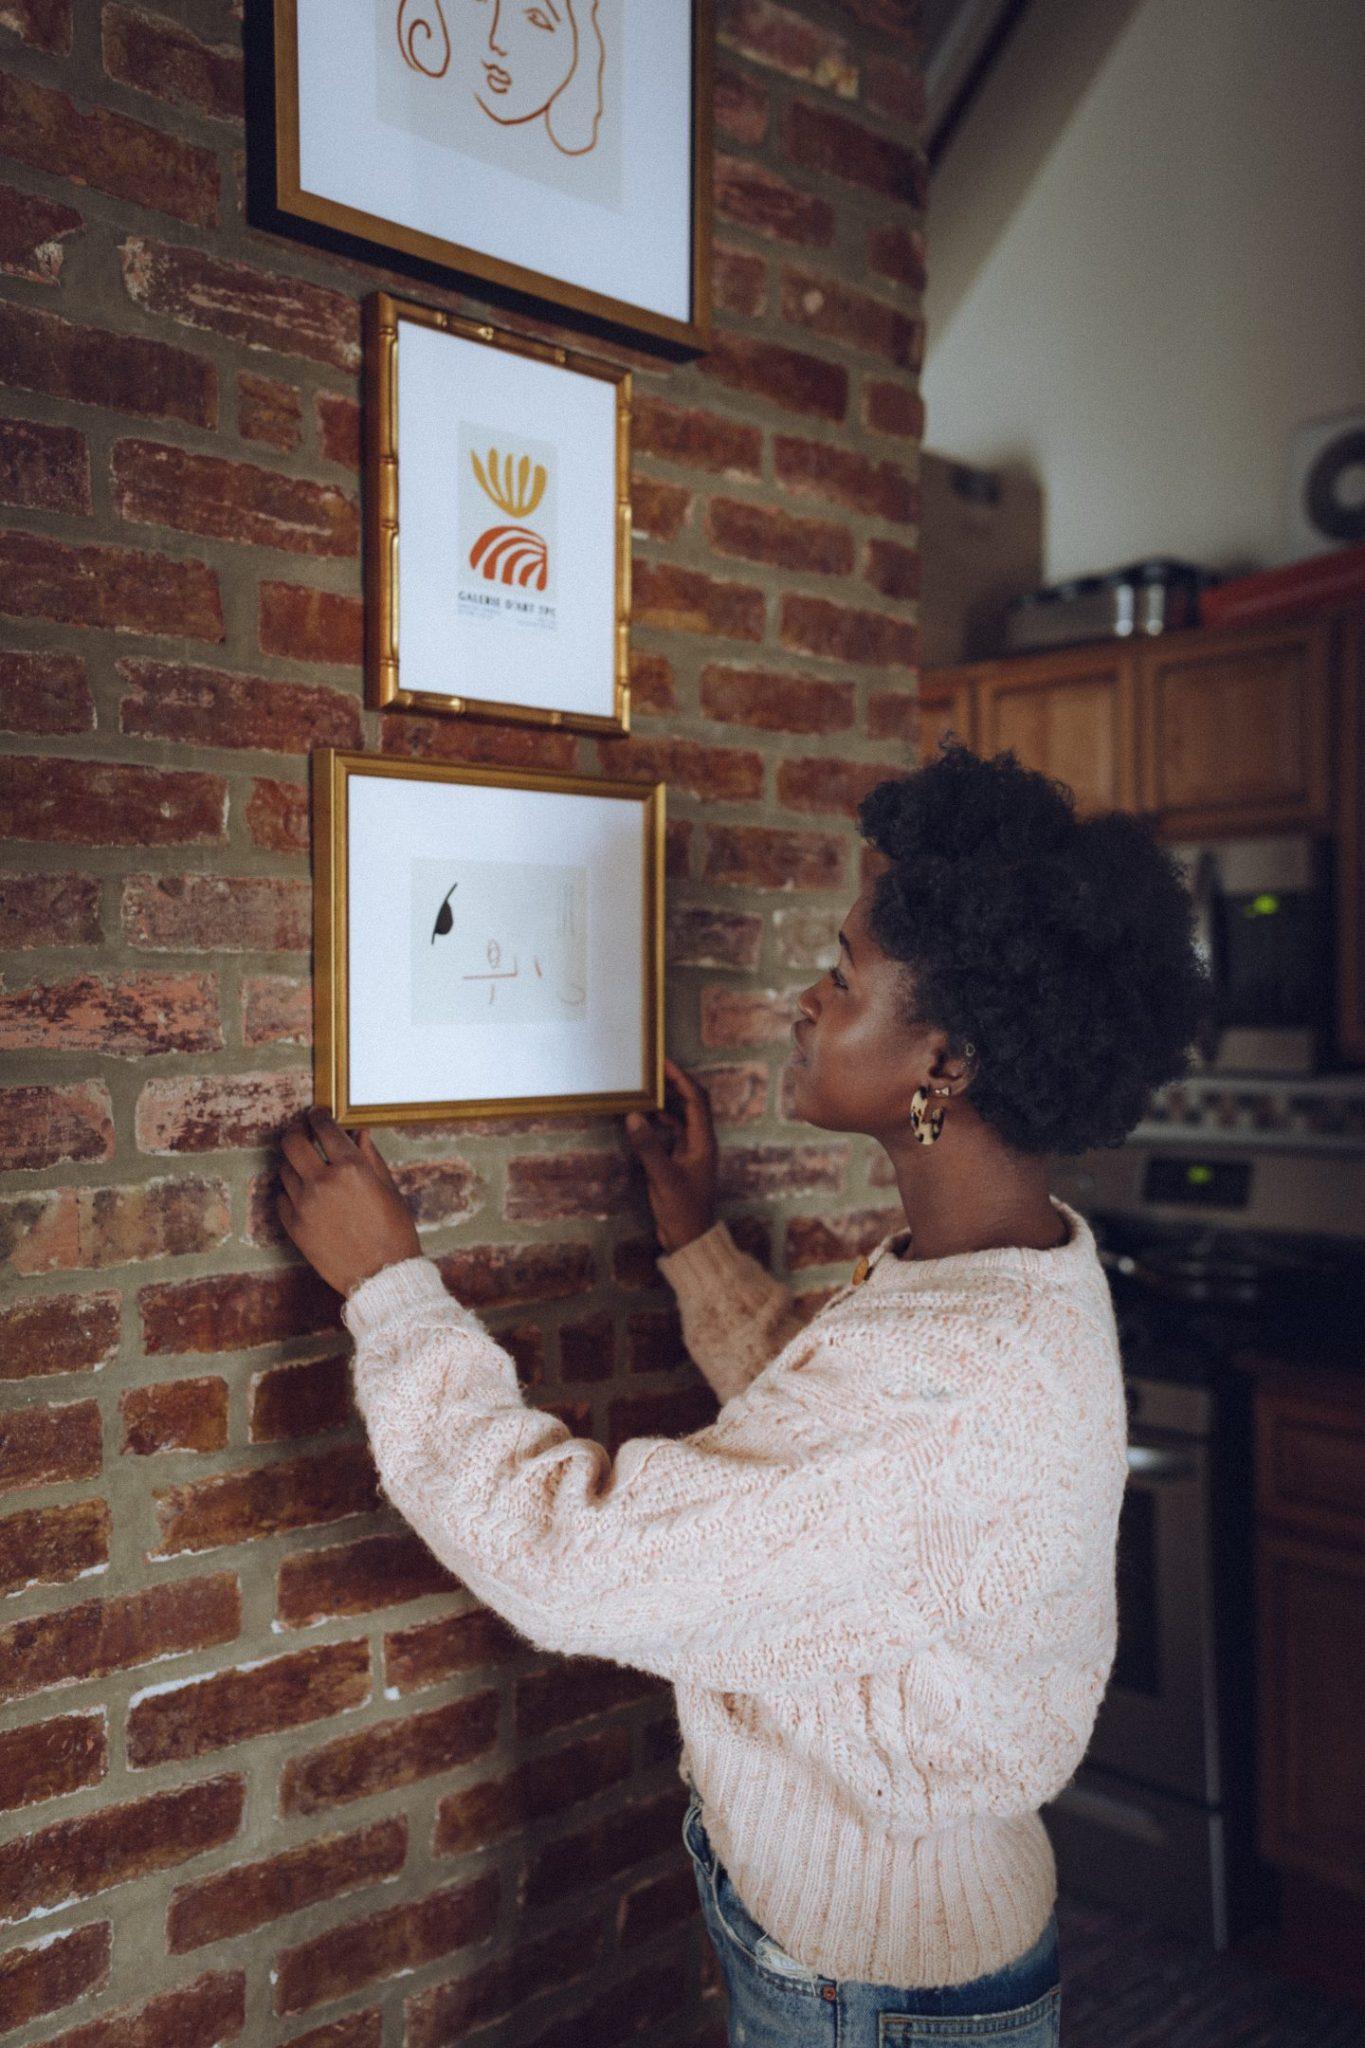 Women Hanging a Frame